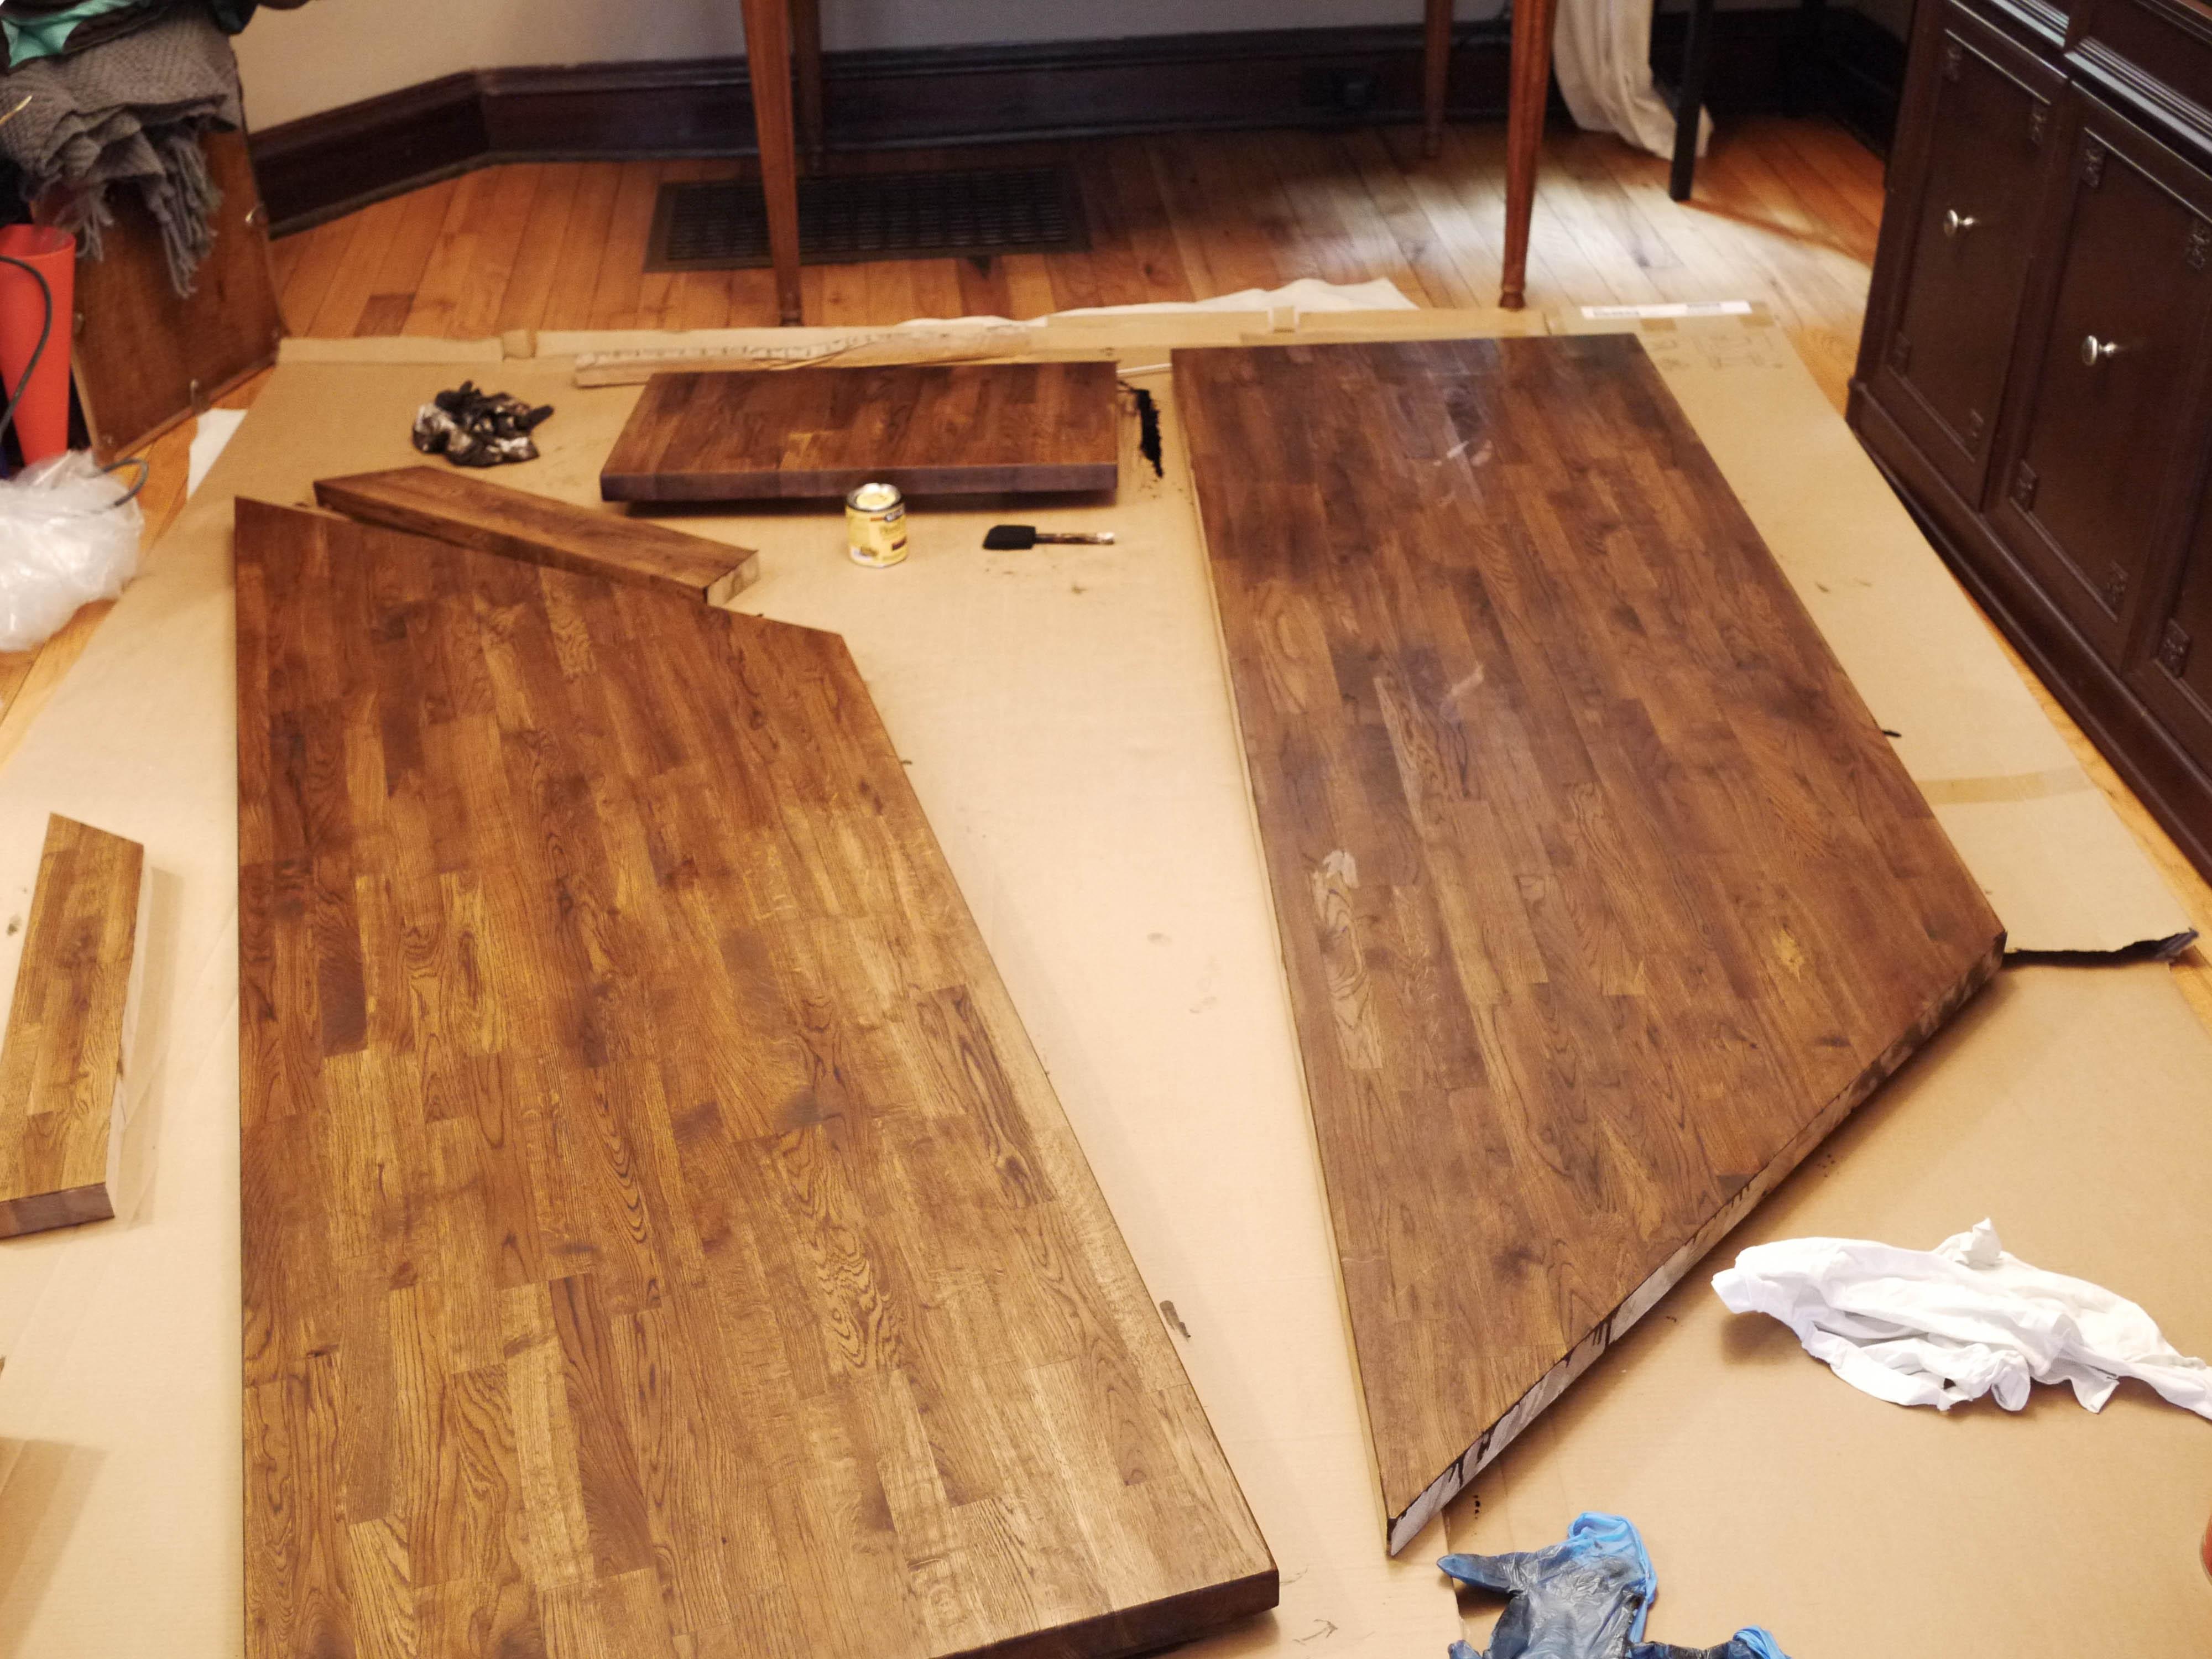 Ikea Butcherblock Countertops Part 1 Kelley Alex